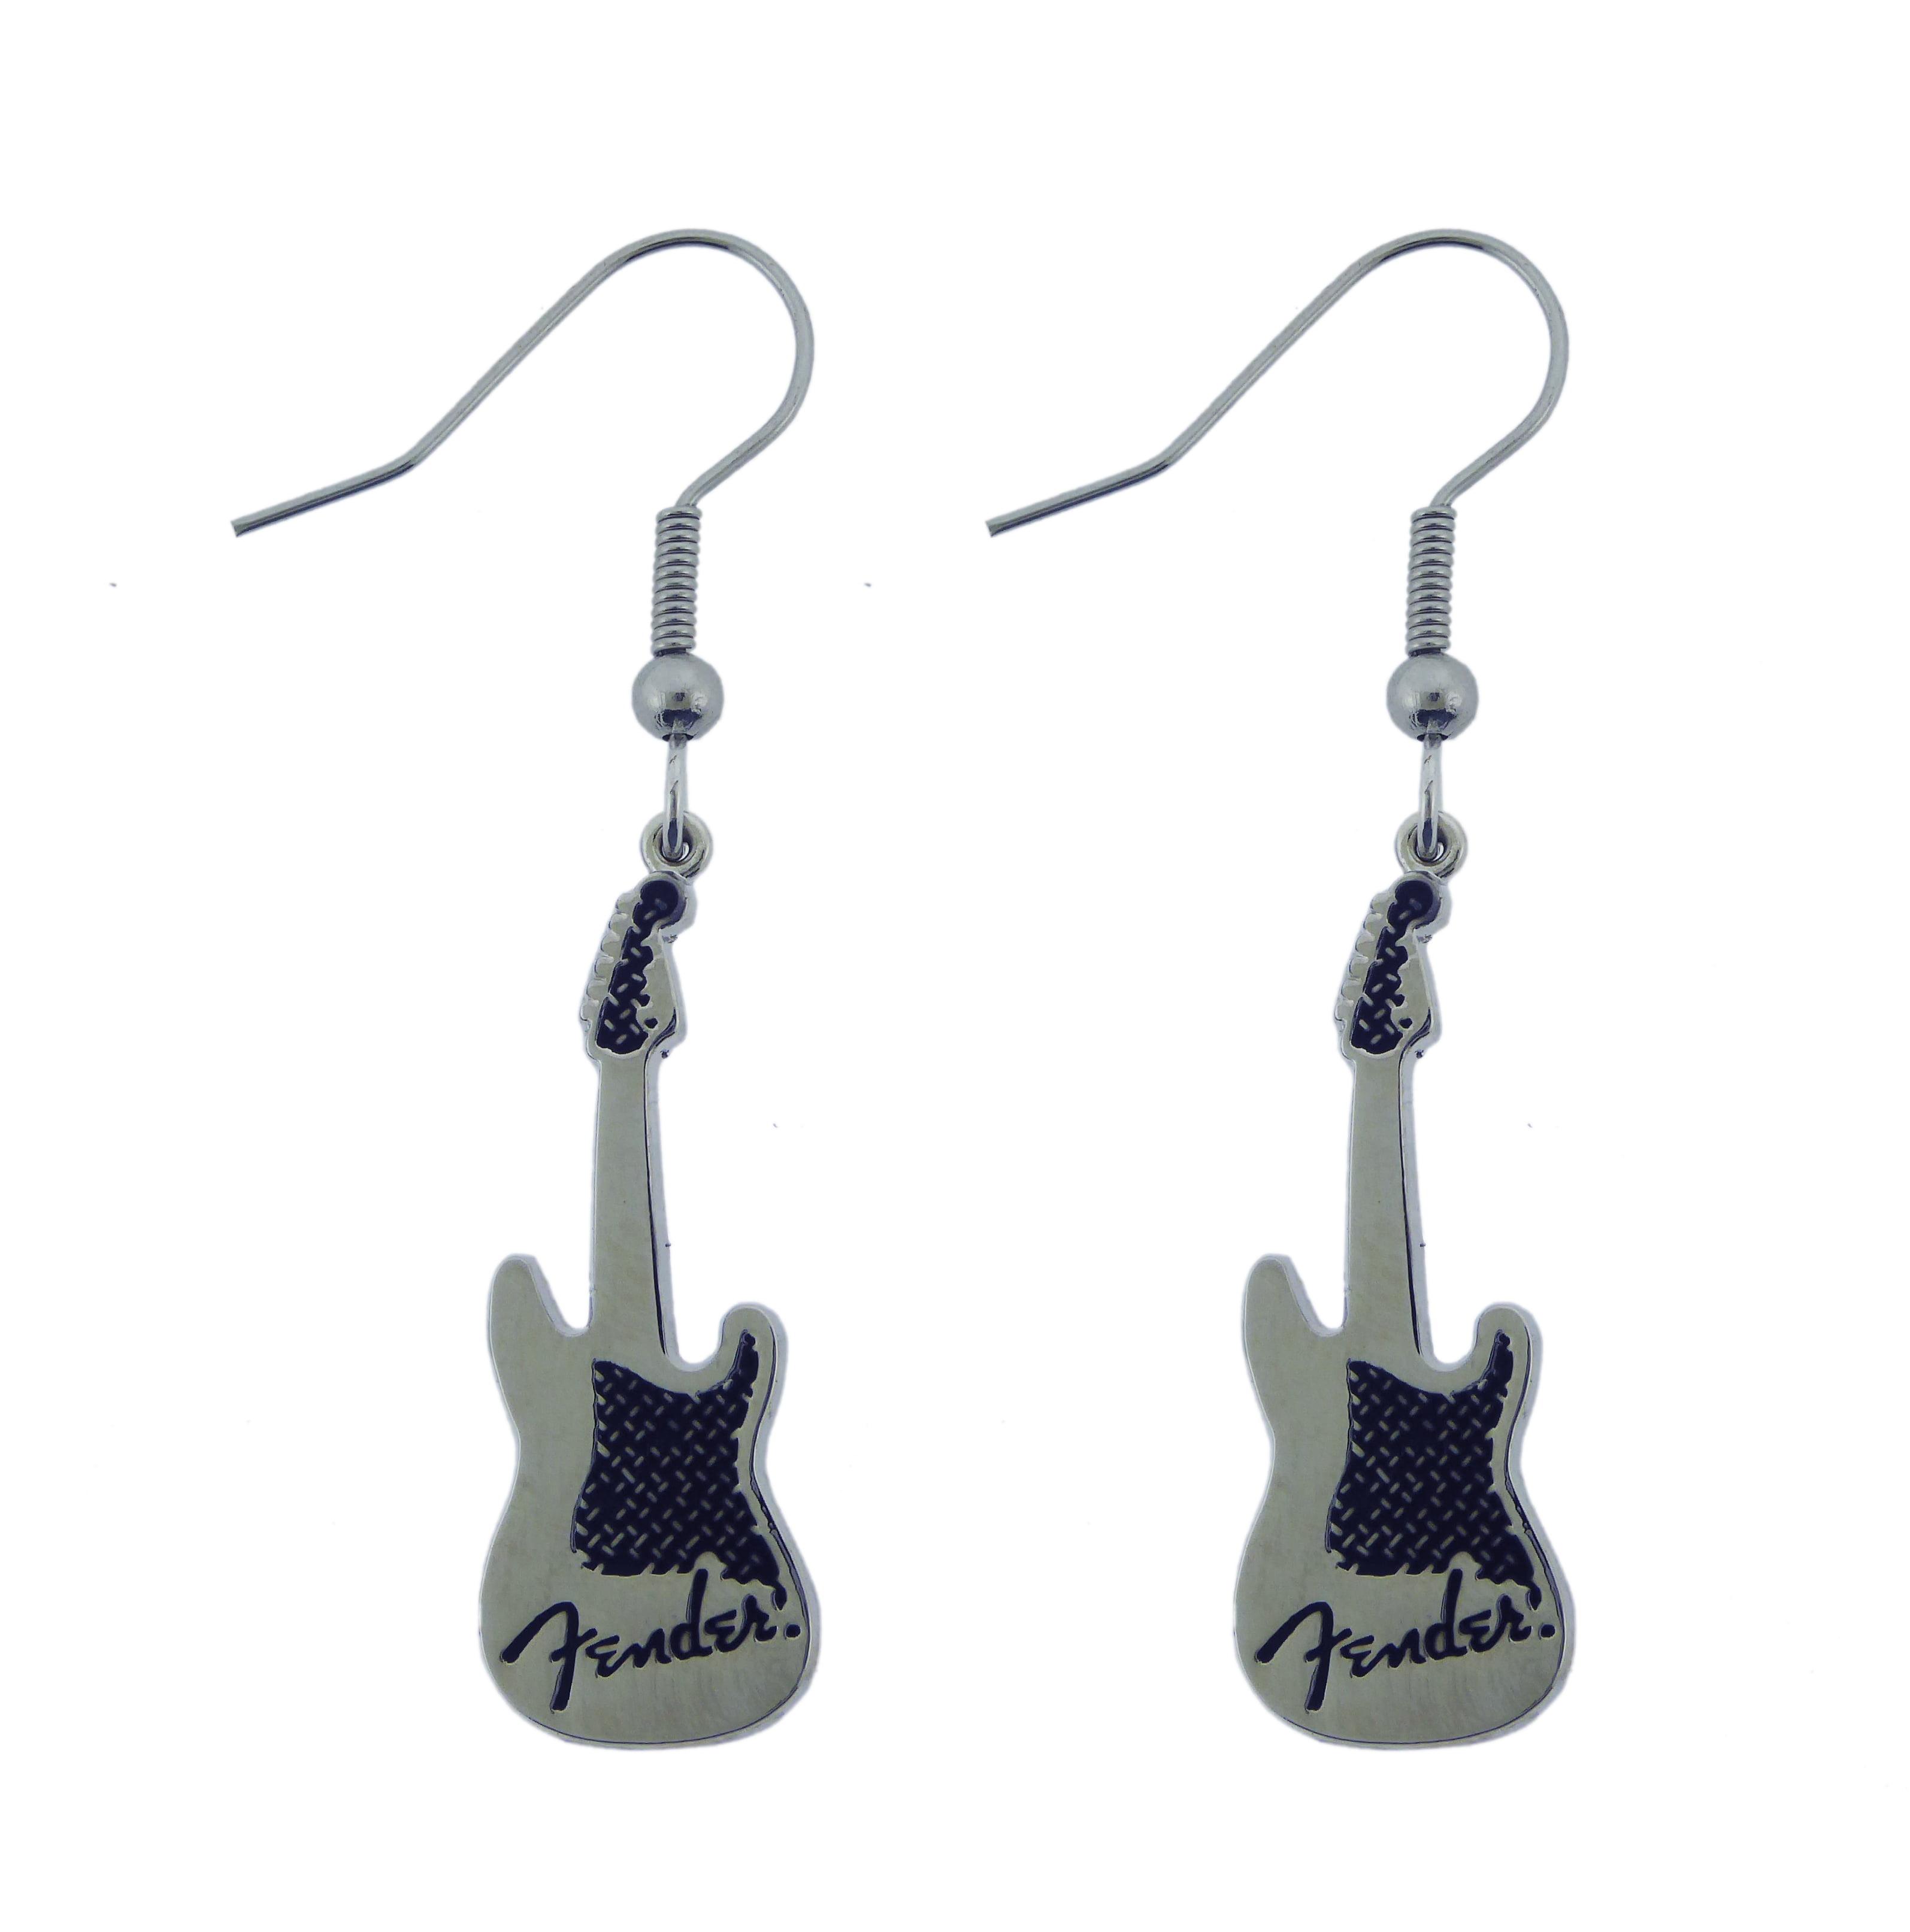 Men Women Silver Metal Belt Buckle Yellow Fender Electric Guitar Music Rocker